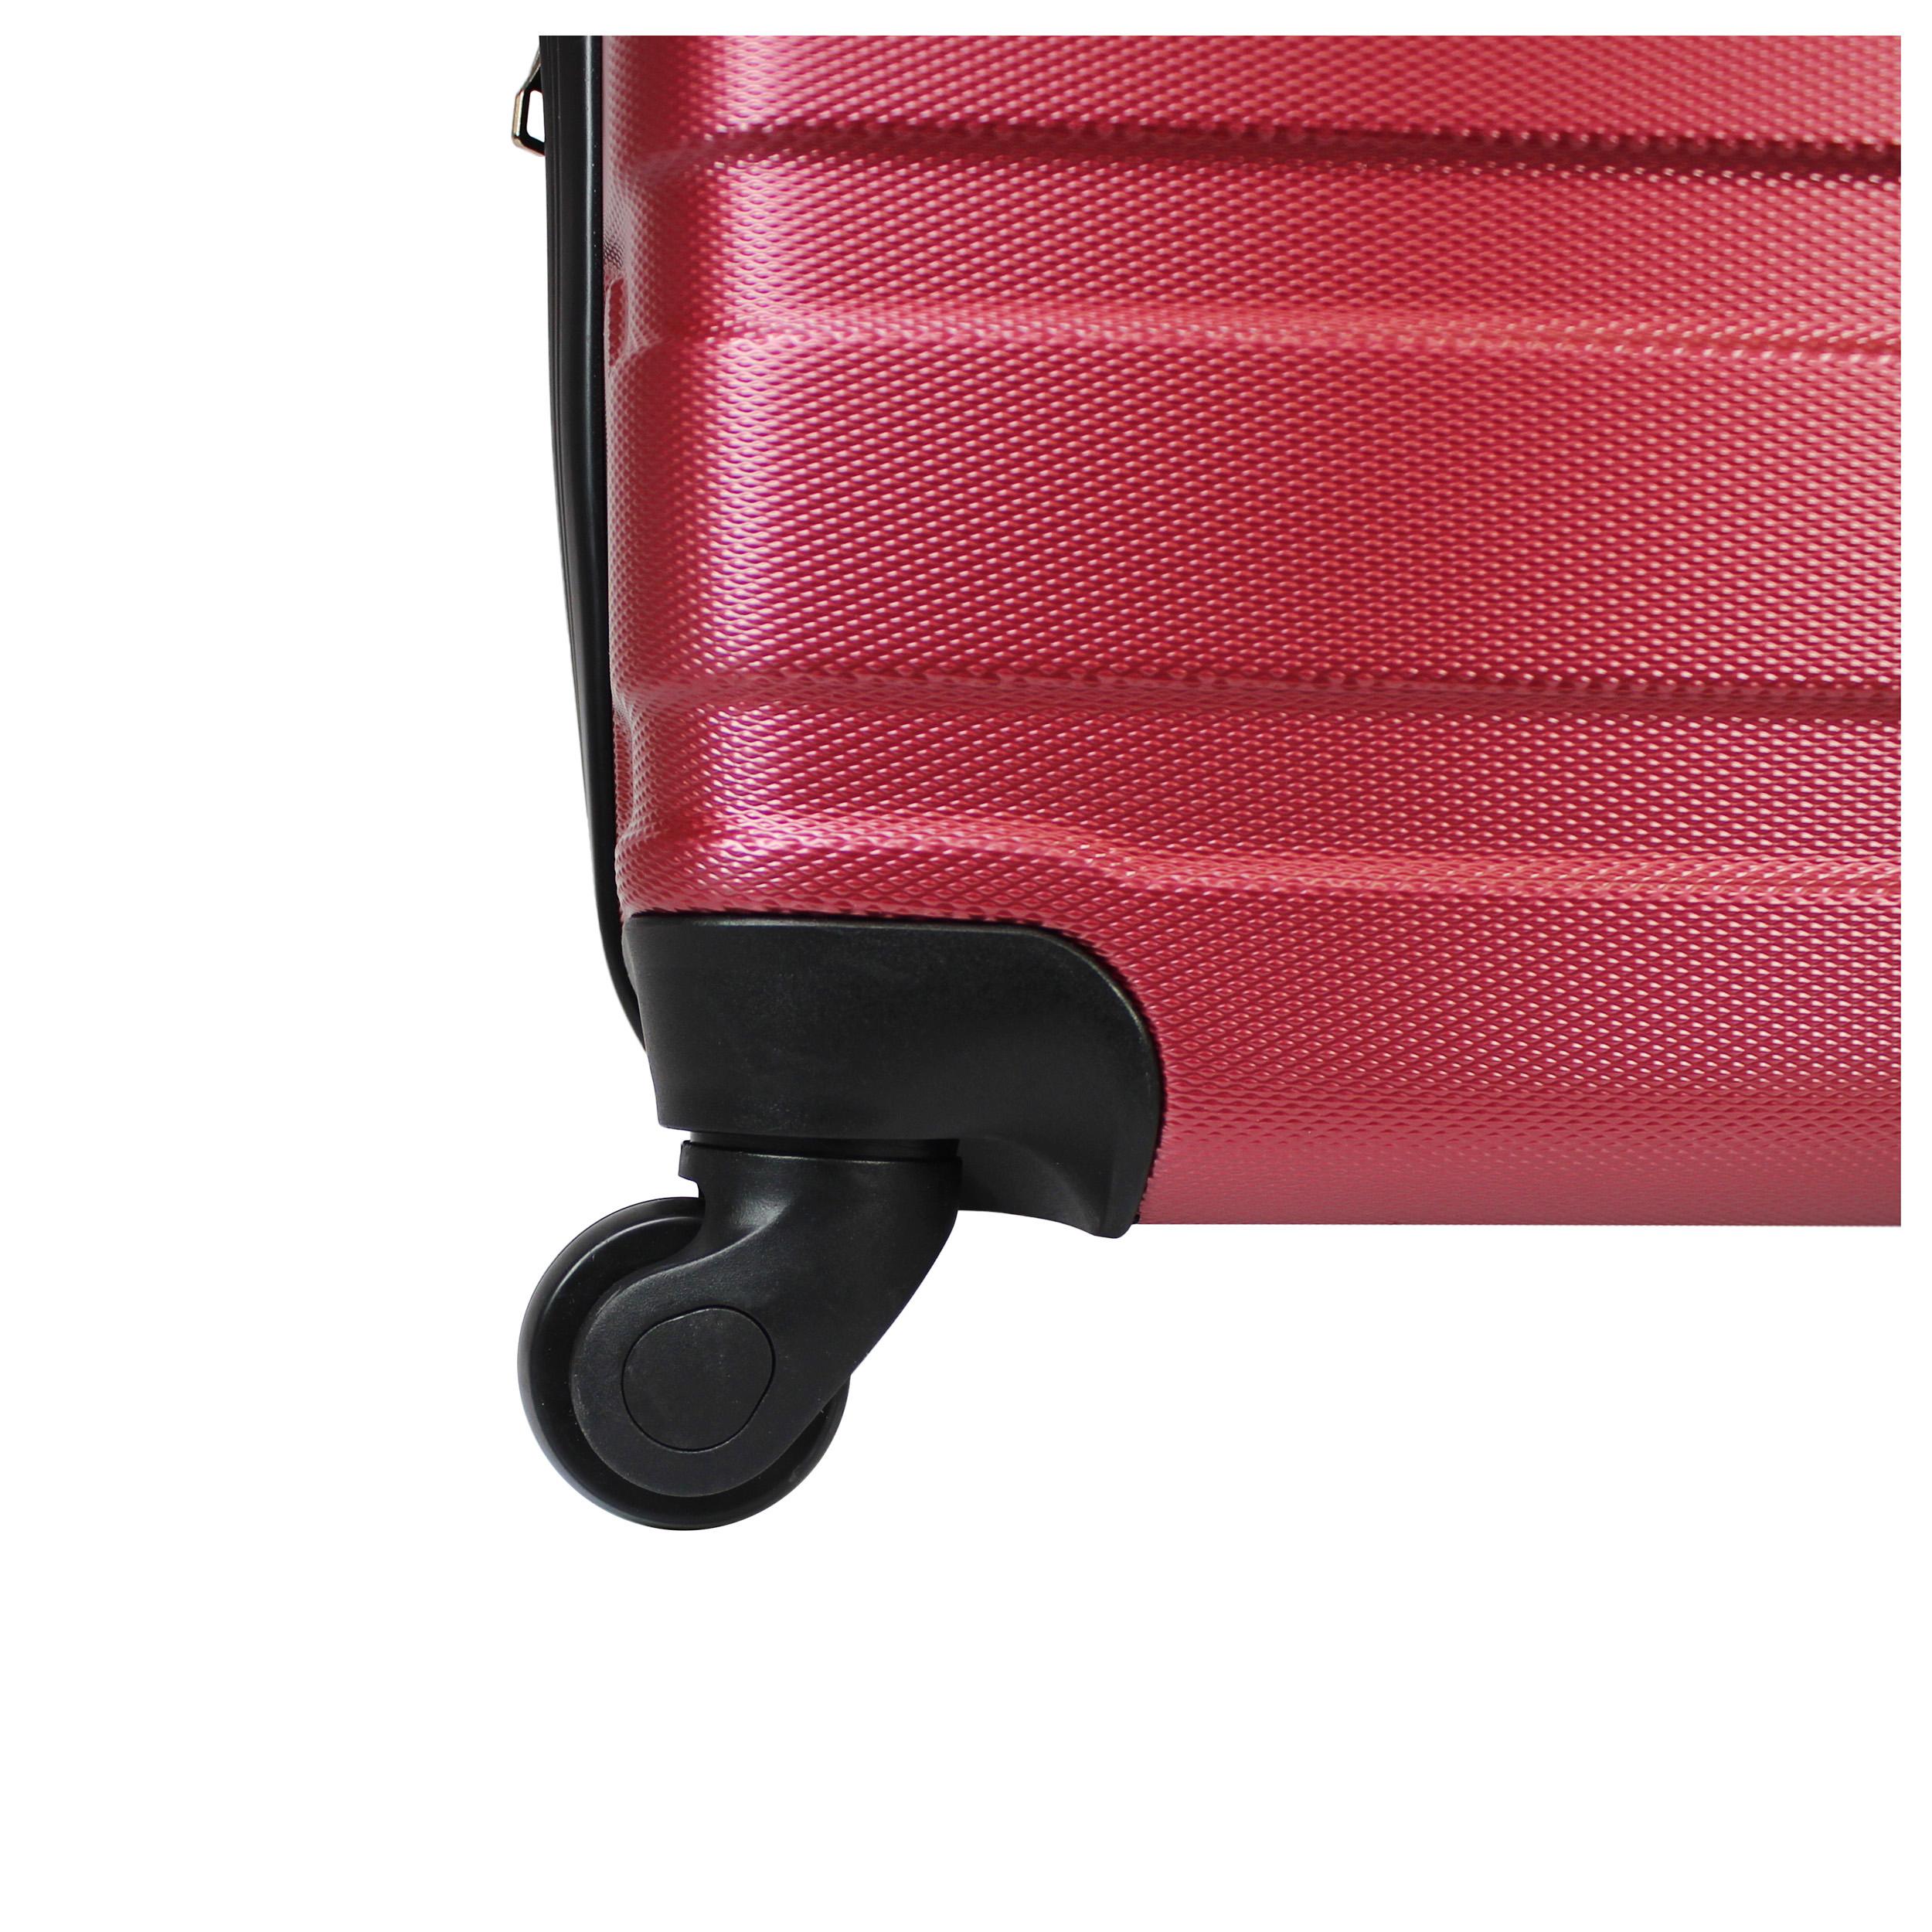 6cde3ceca Luggage & Travel Gear Burgundy AMKA Verano Hardside 3-Piece Expandable  Spinner Upright Luggage Set Luggage